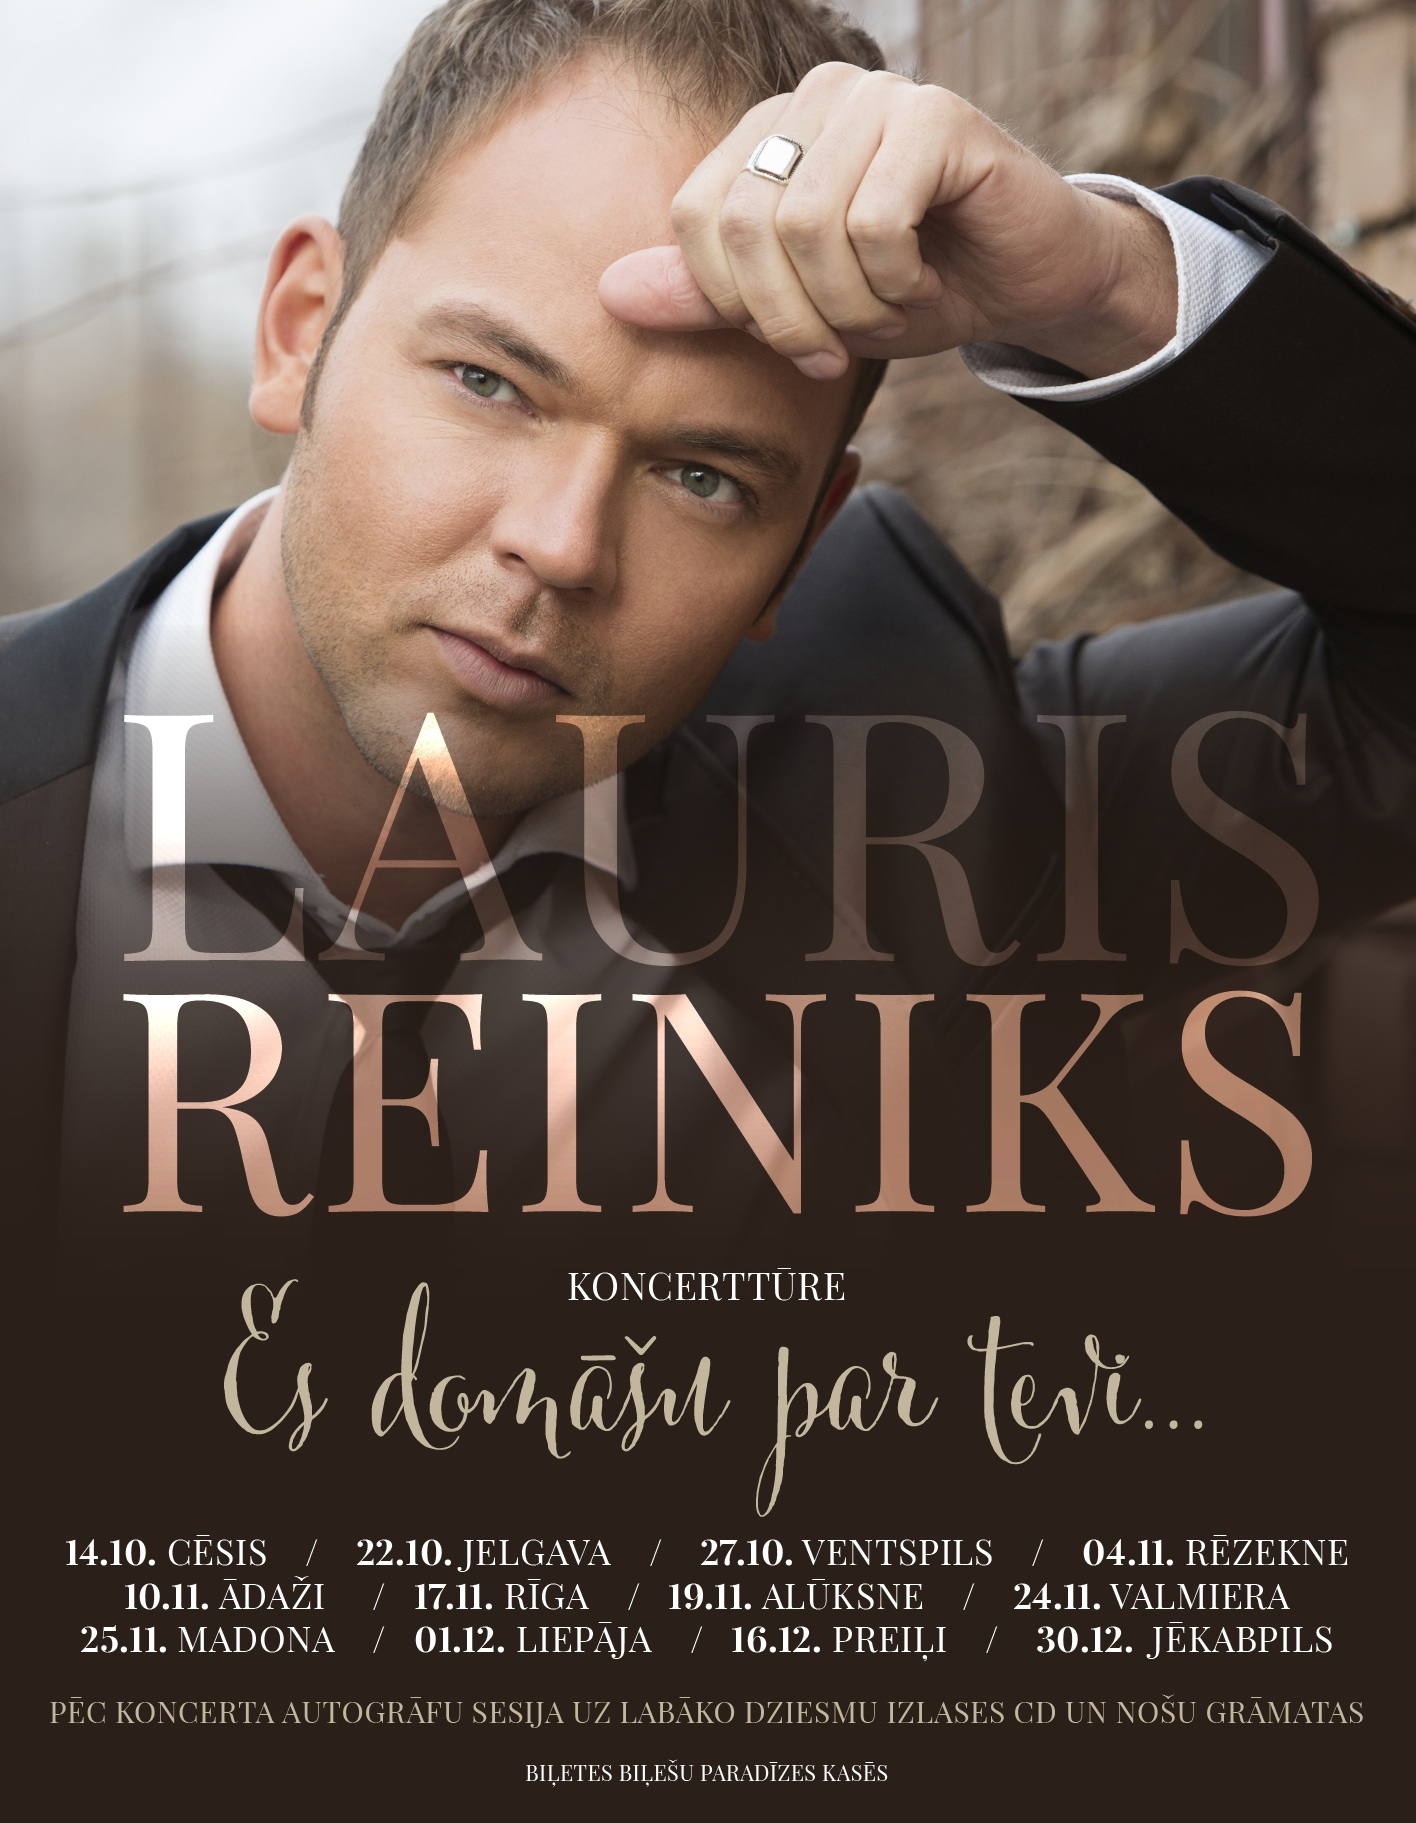 Lauris-Reiniks-ture-2017